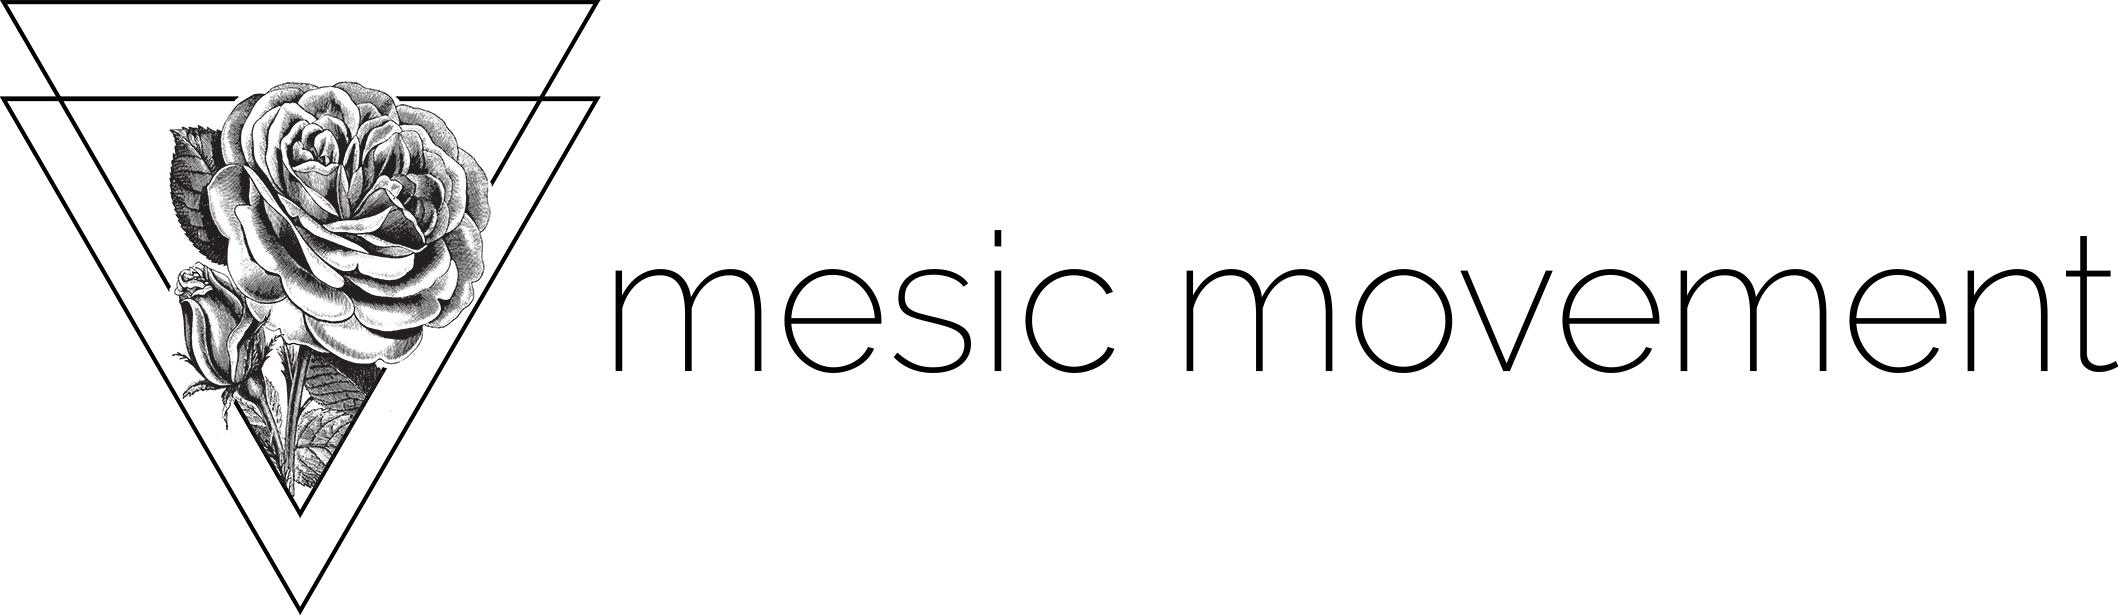 mesic movement logo_web.jpg